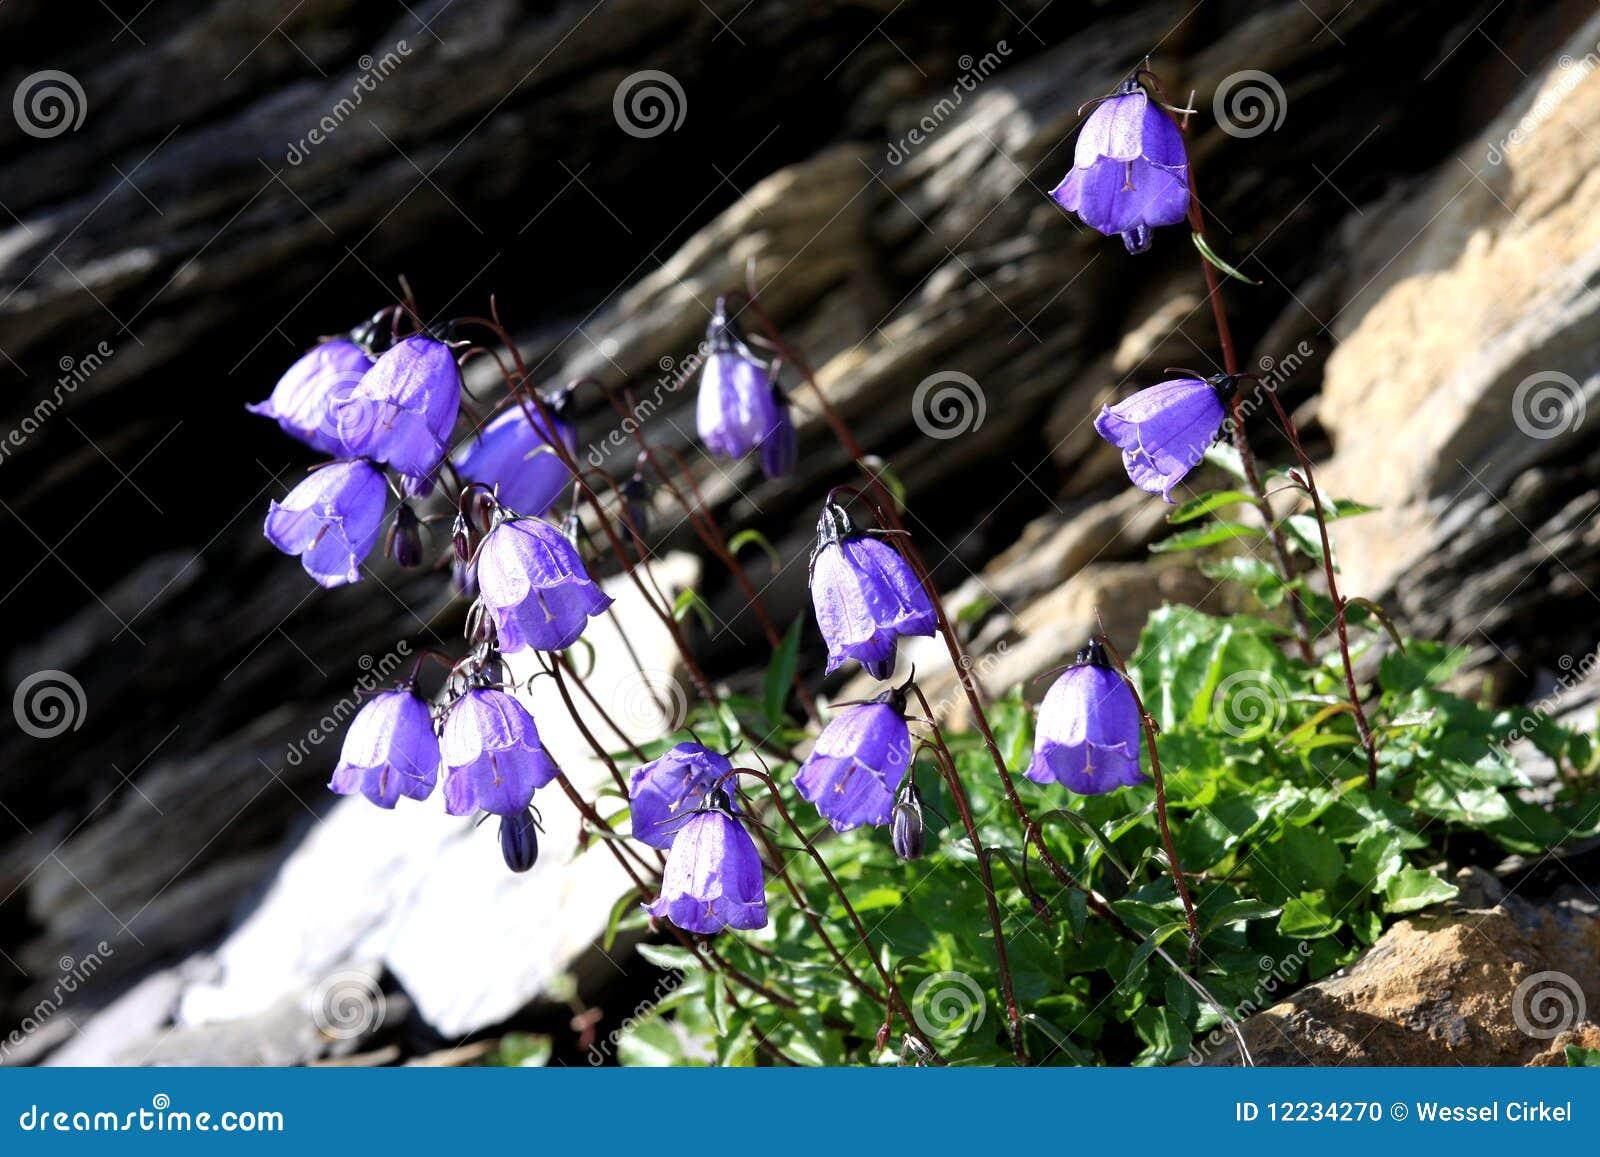 Flowering alpine bellflower in the Swiss mountains